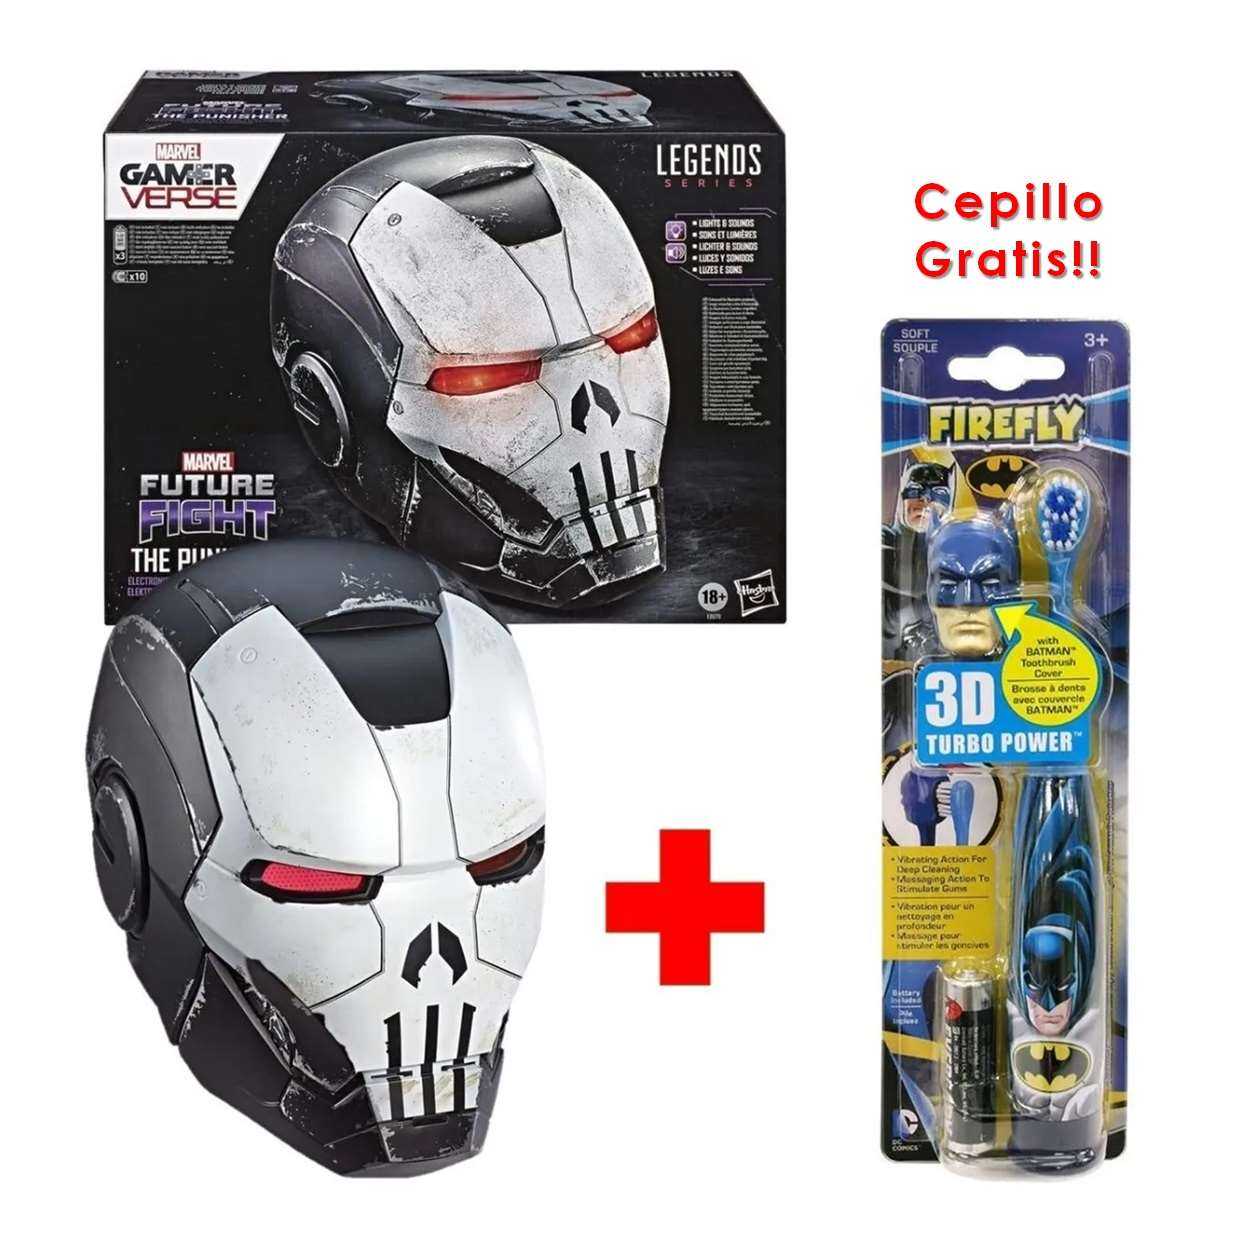 War Machine Punisher Casco Electrónico Marvel Legen + Cepillo GRATIS!!